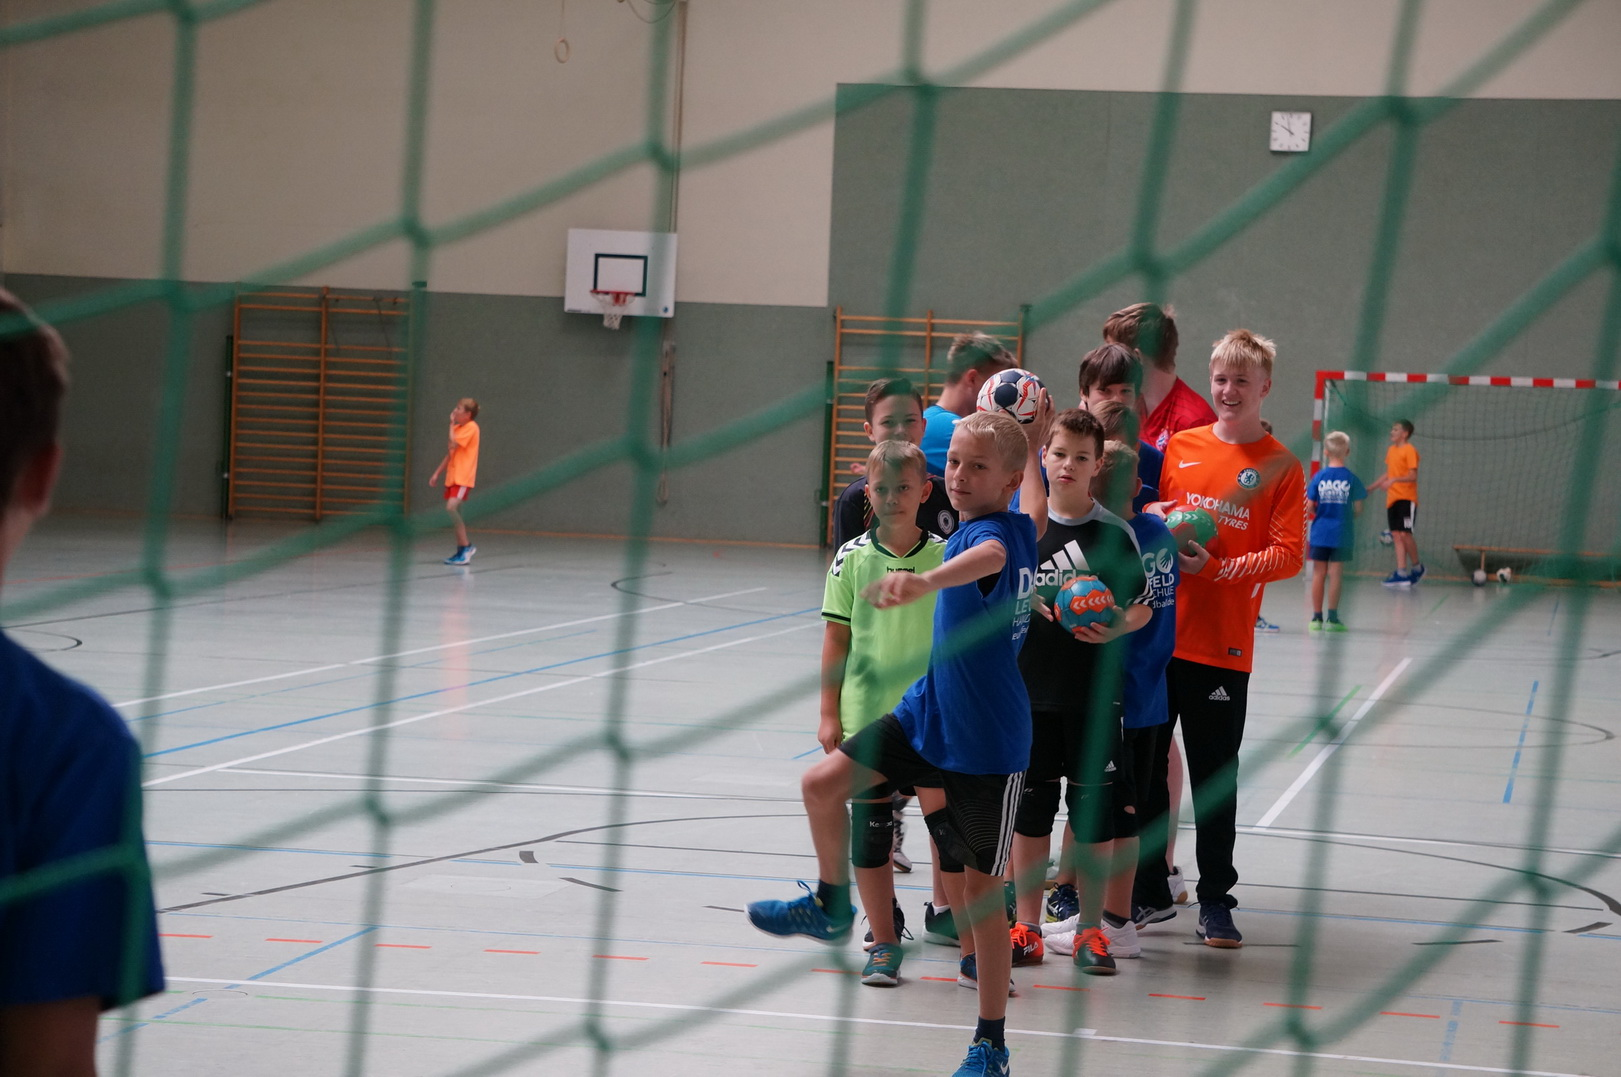 201808_Handballcamp_SDH_MG_137w